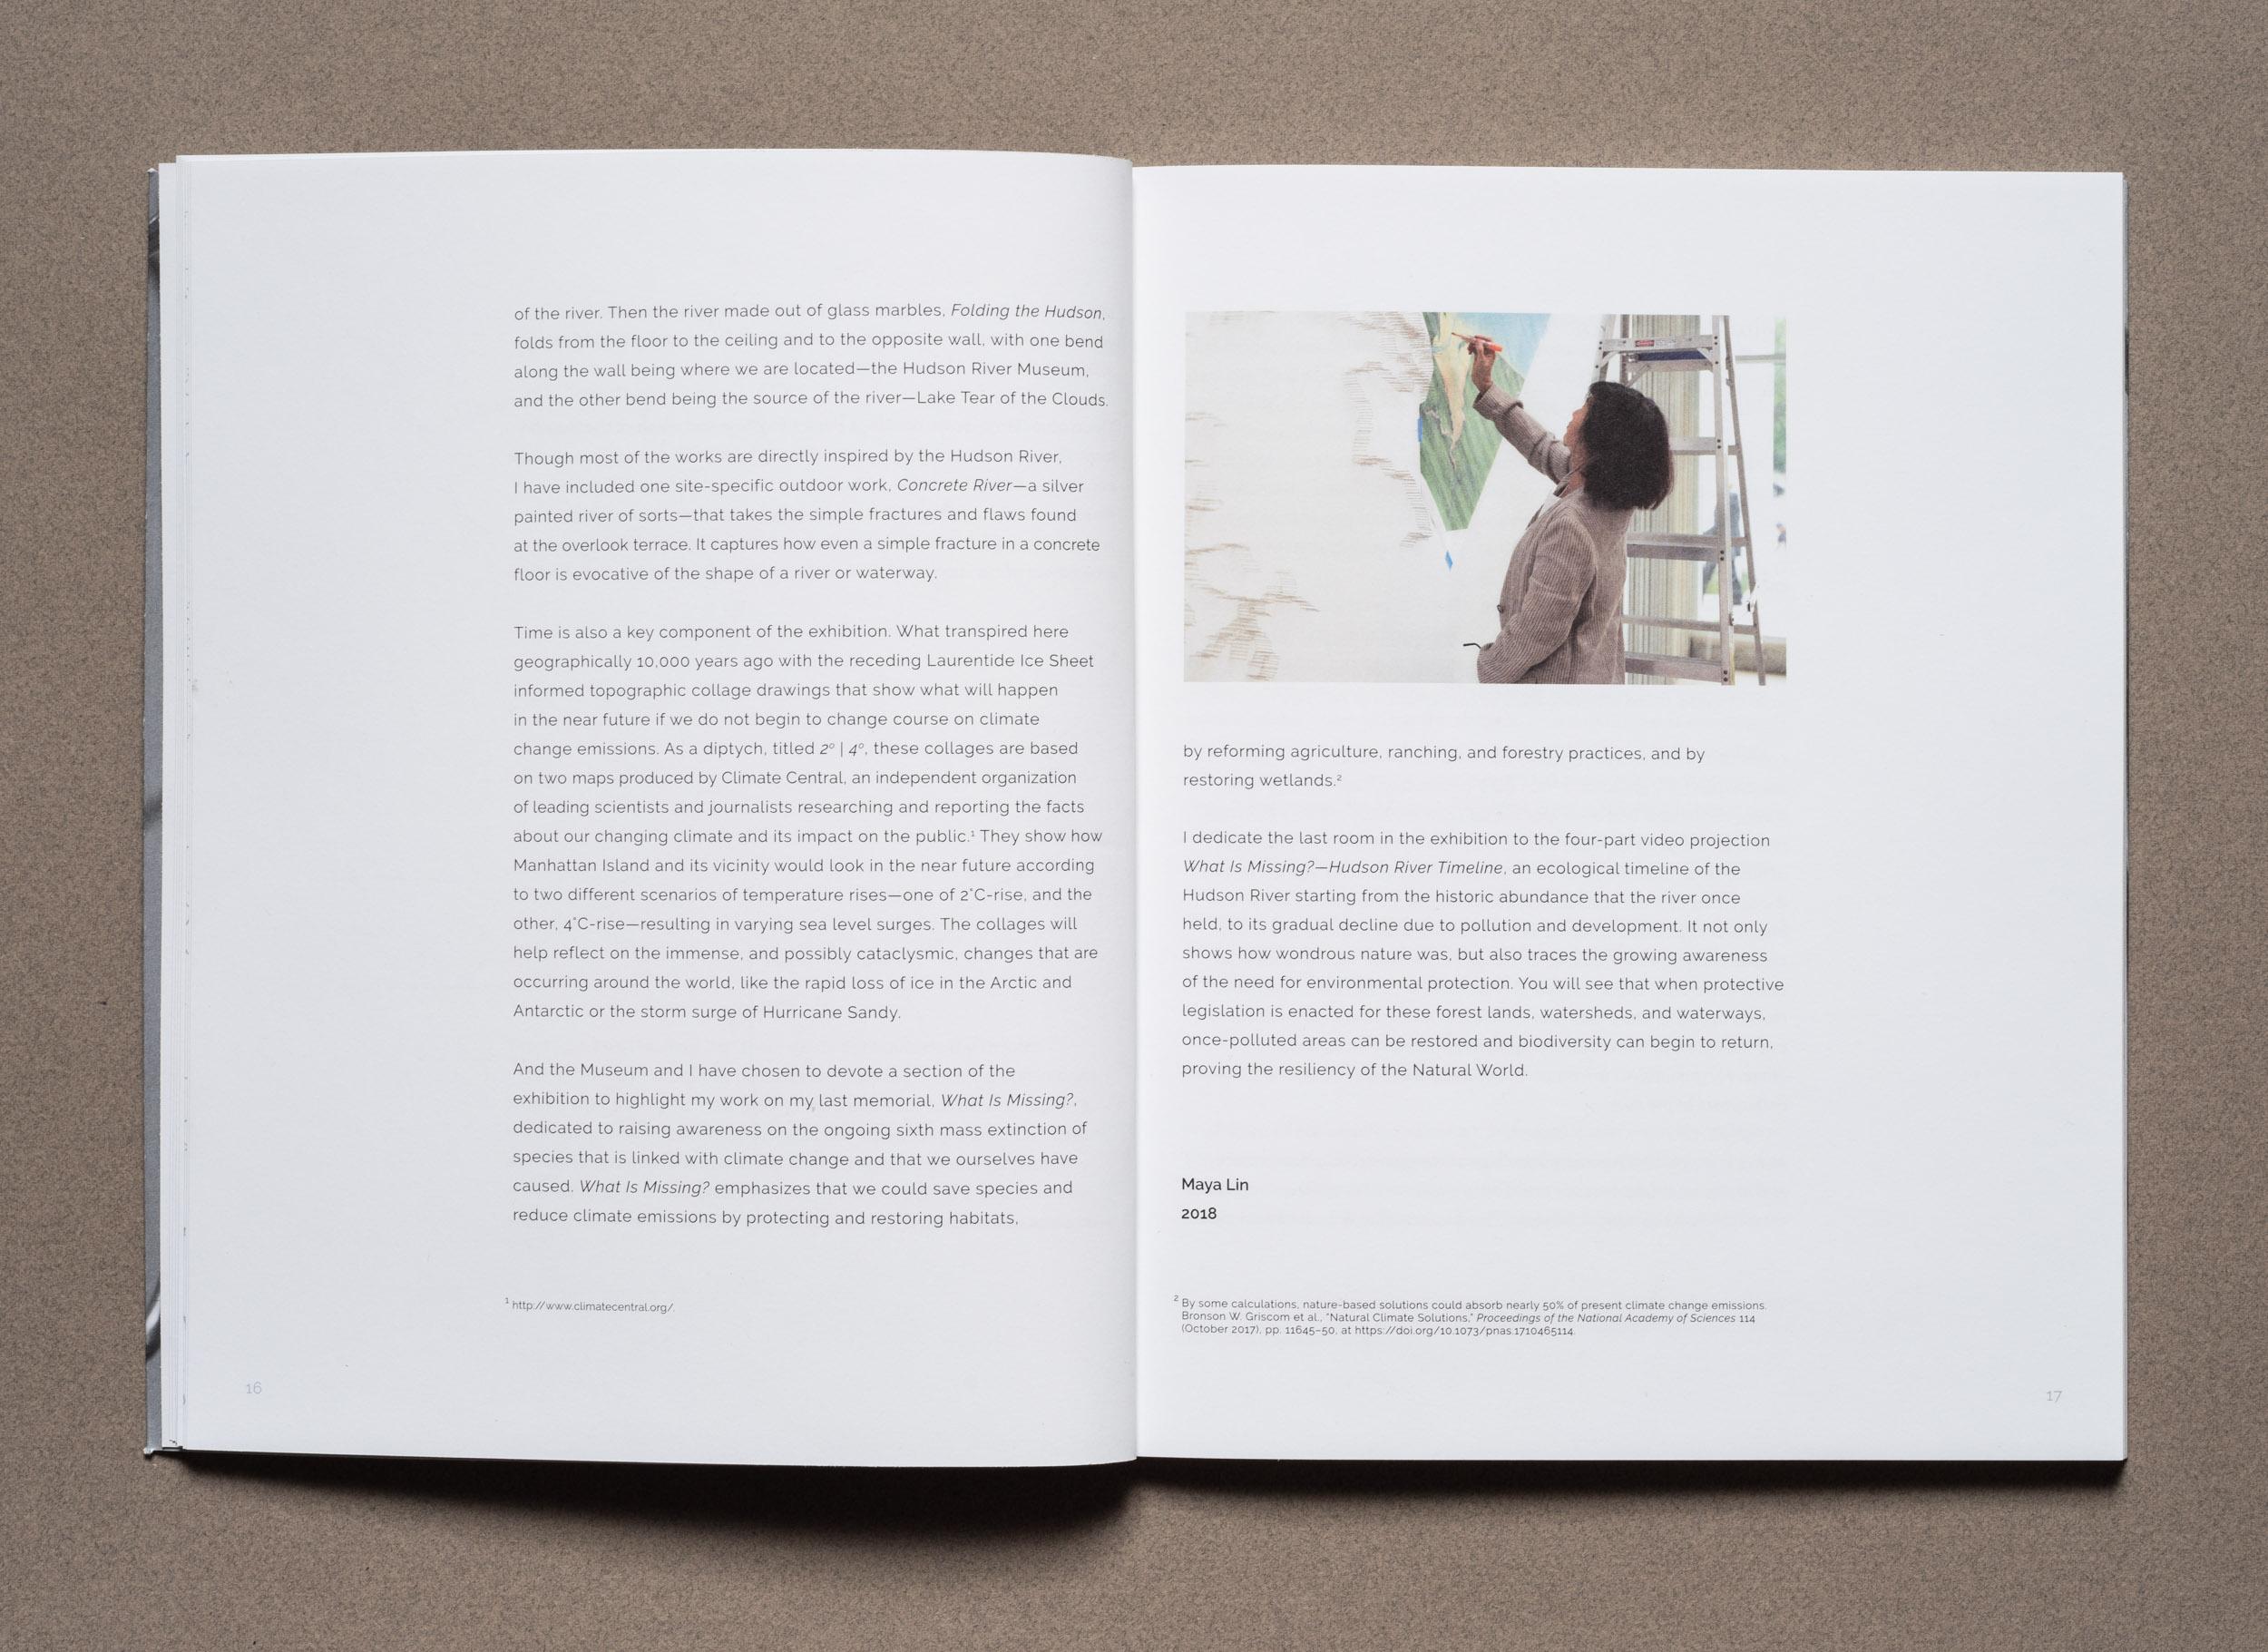 Maya Lin Catalog_02.jpg